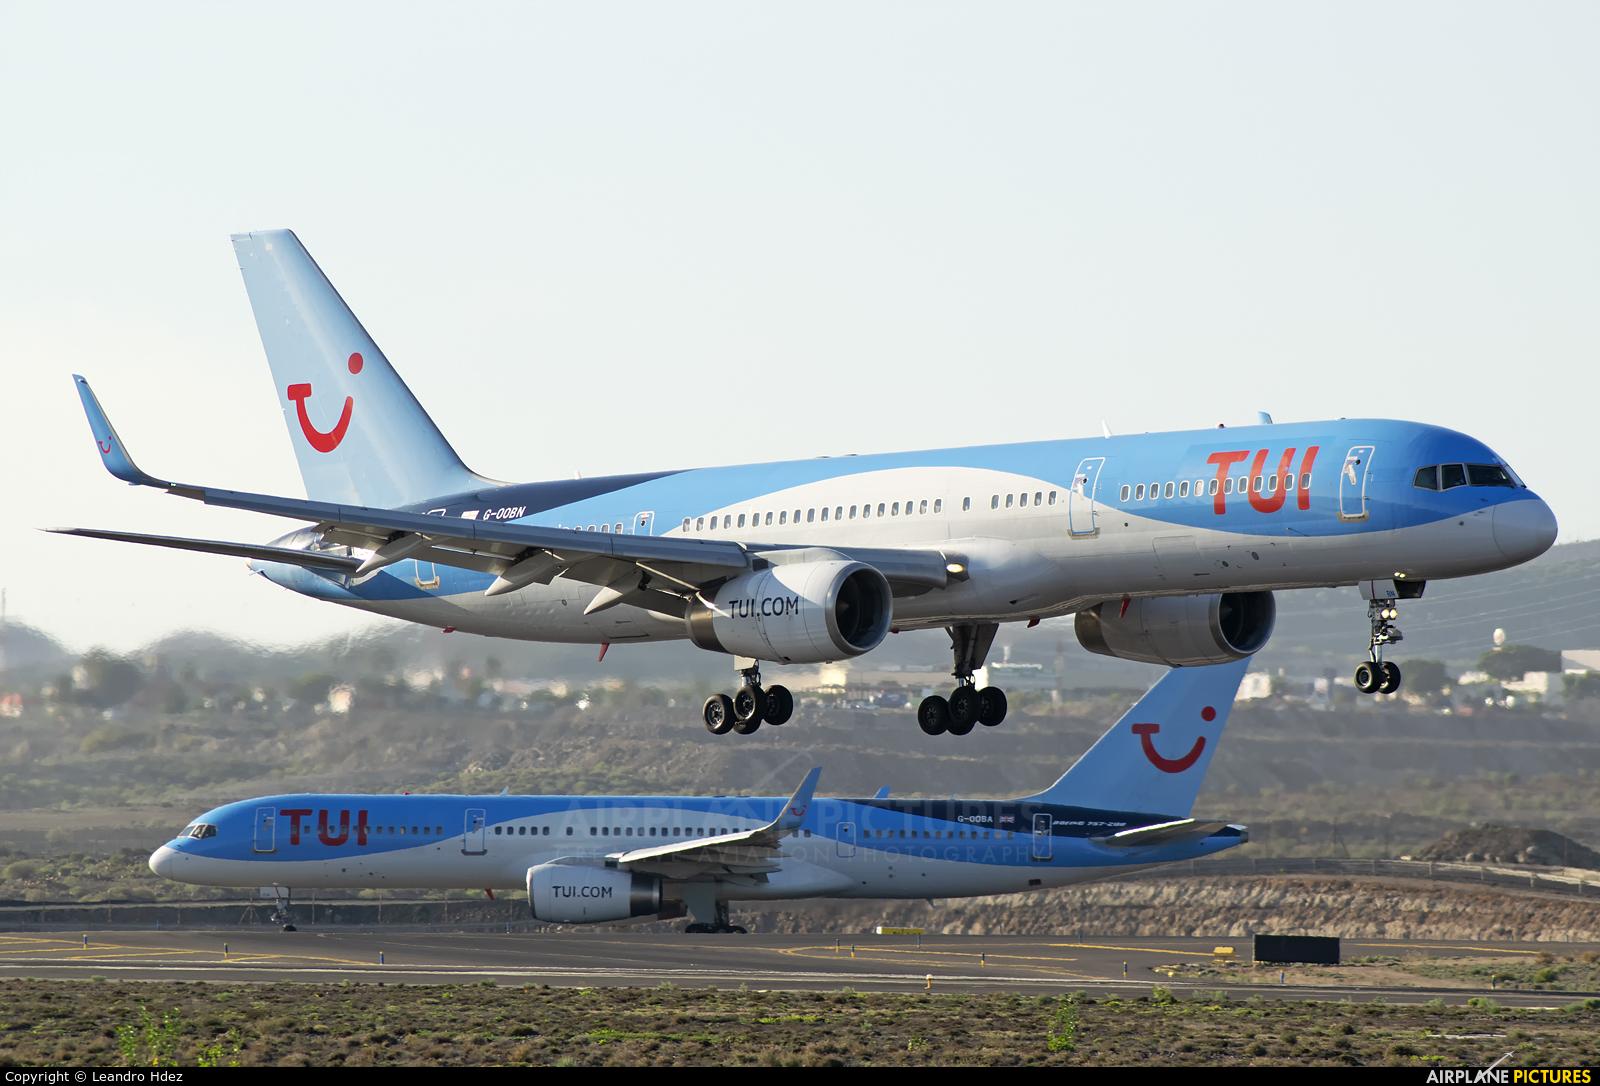 TUI Airways G-OOBN aircraft at Tenerife Sur - Reina Sofia